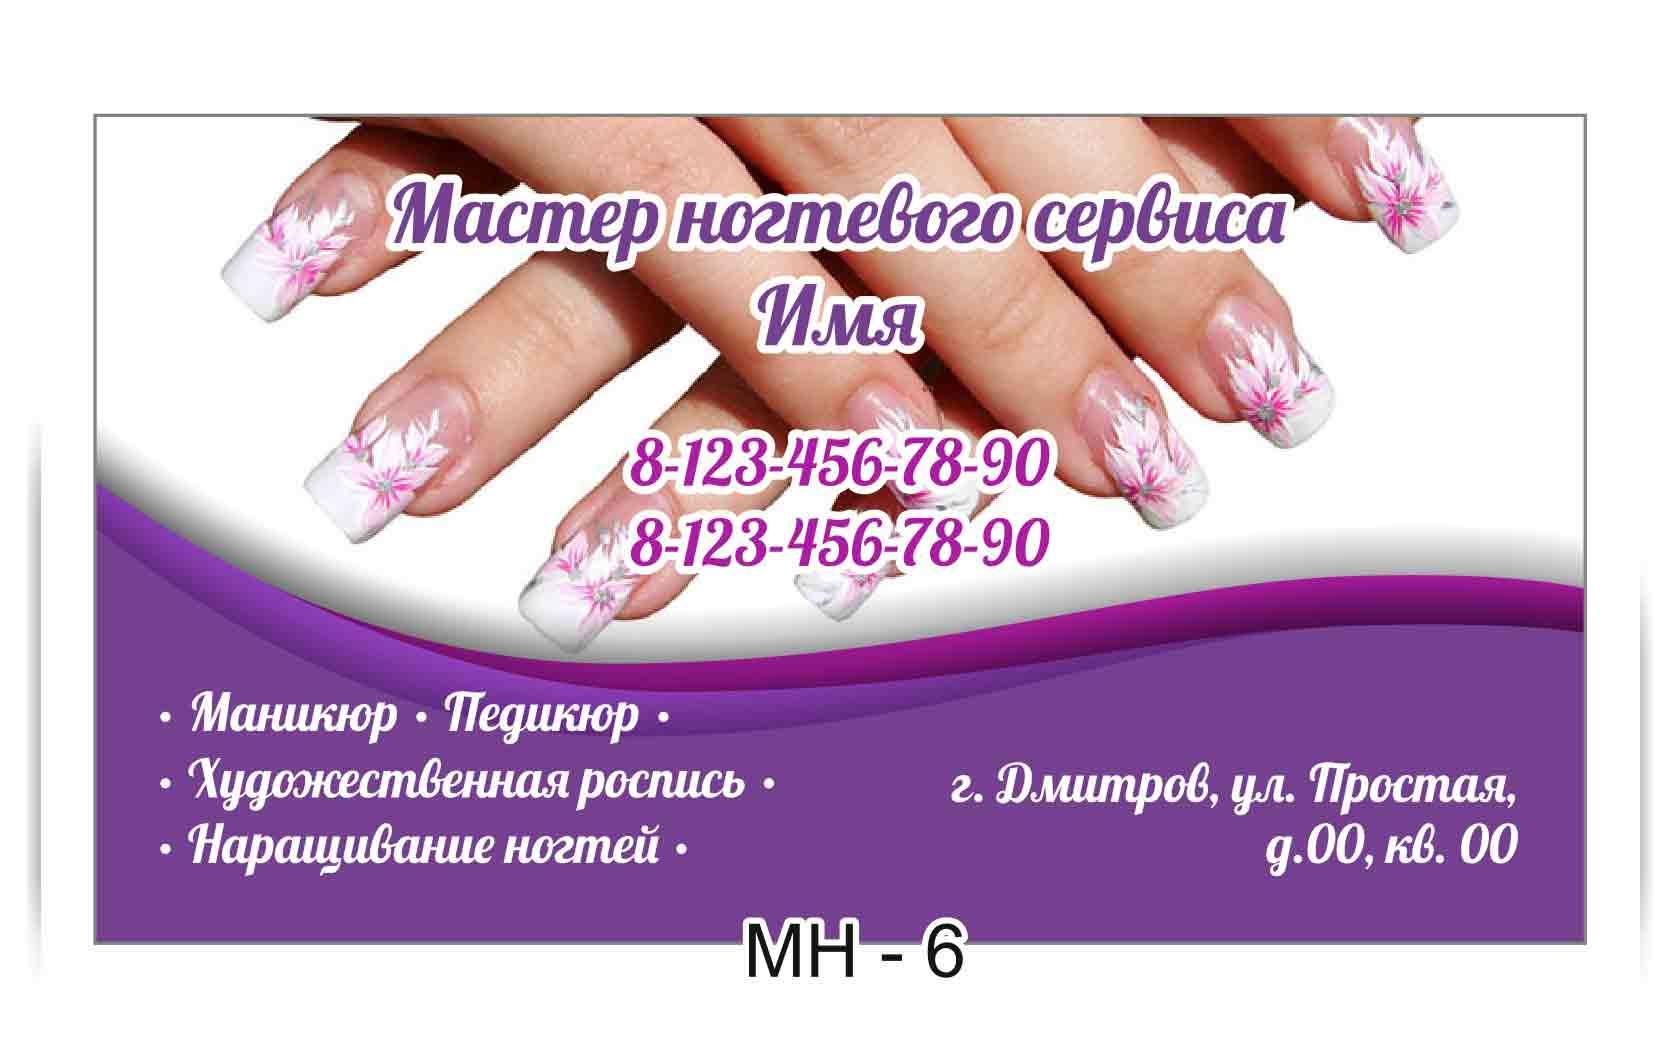 Фото визиток по маникюру